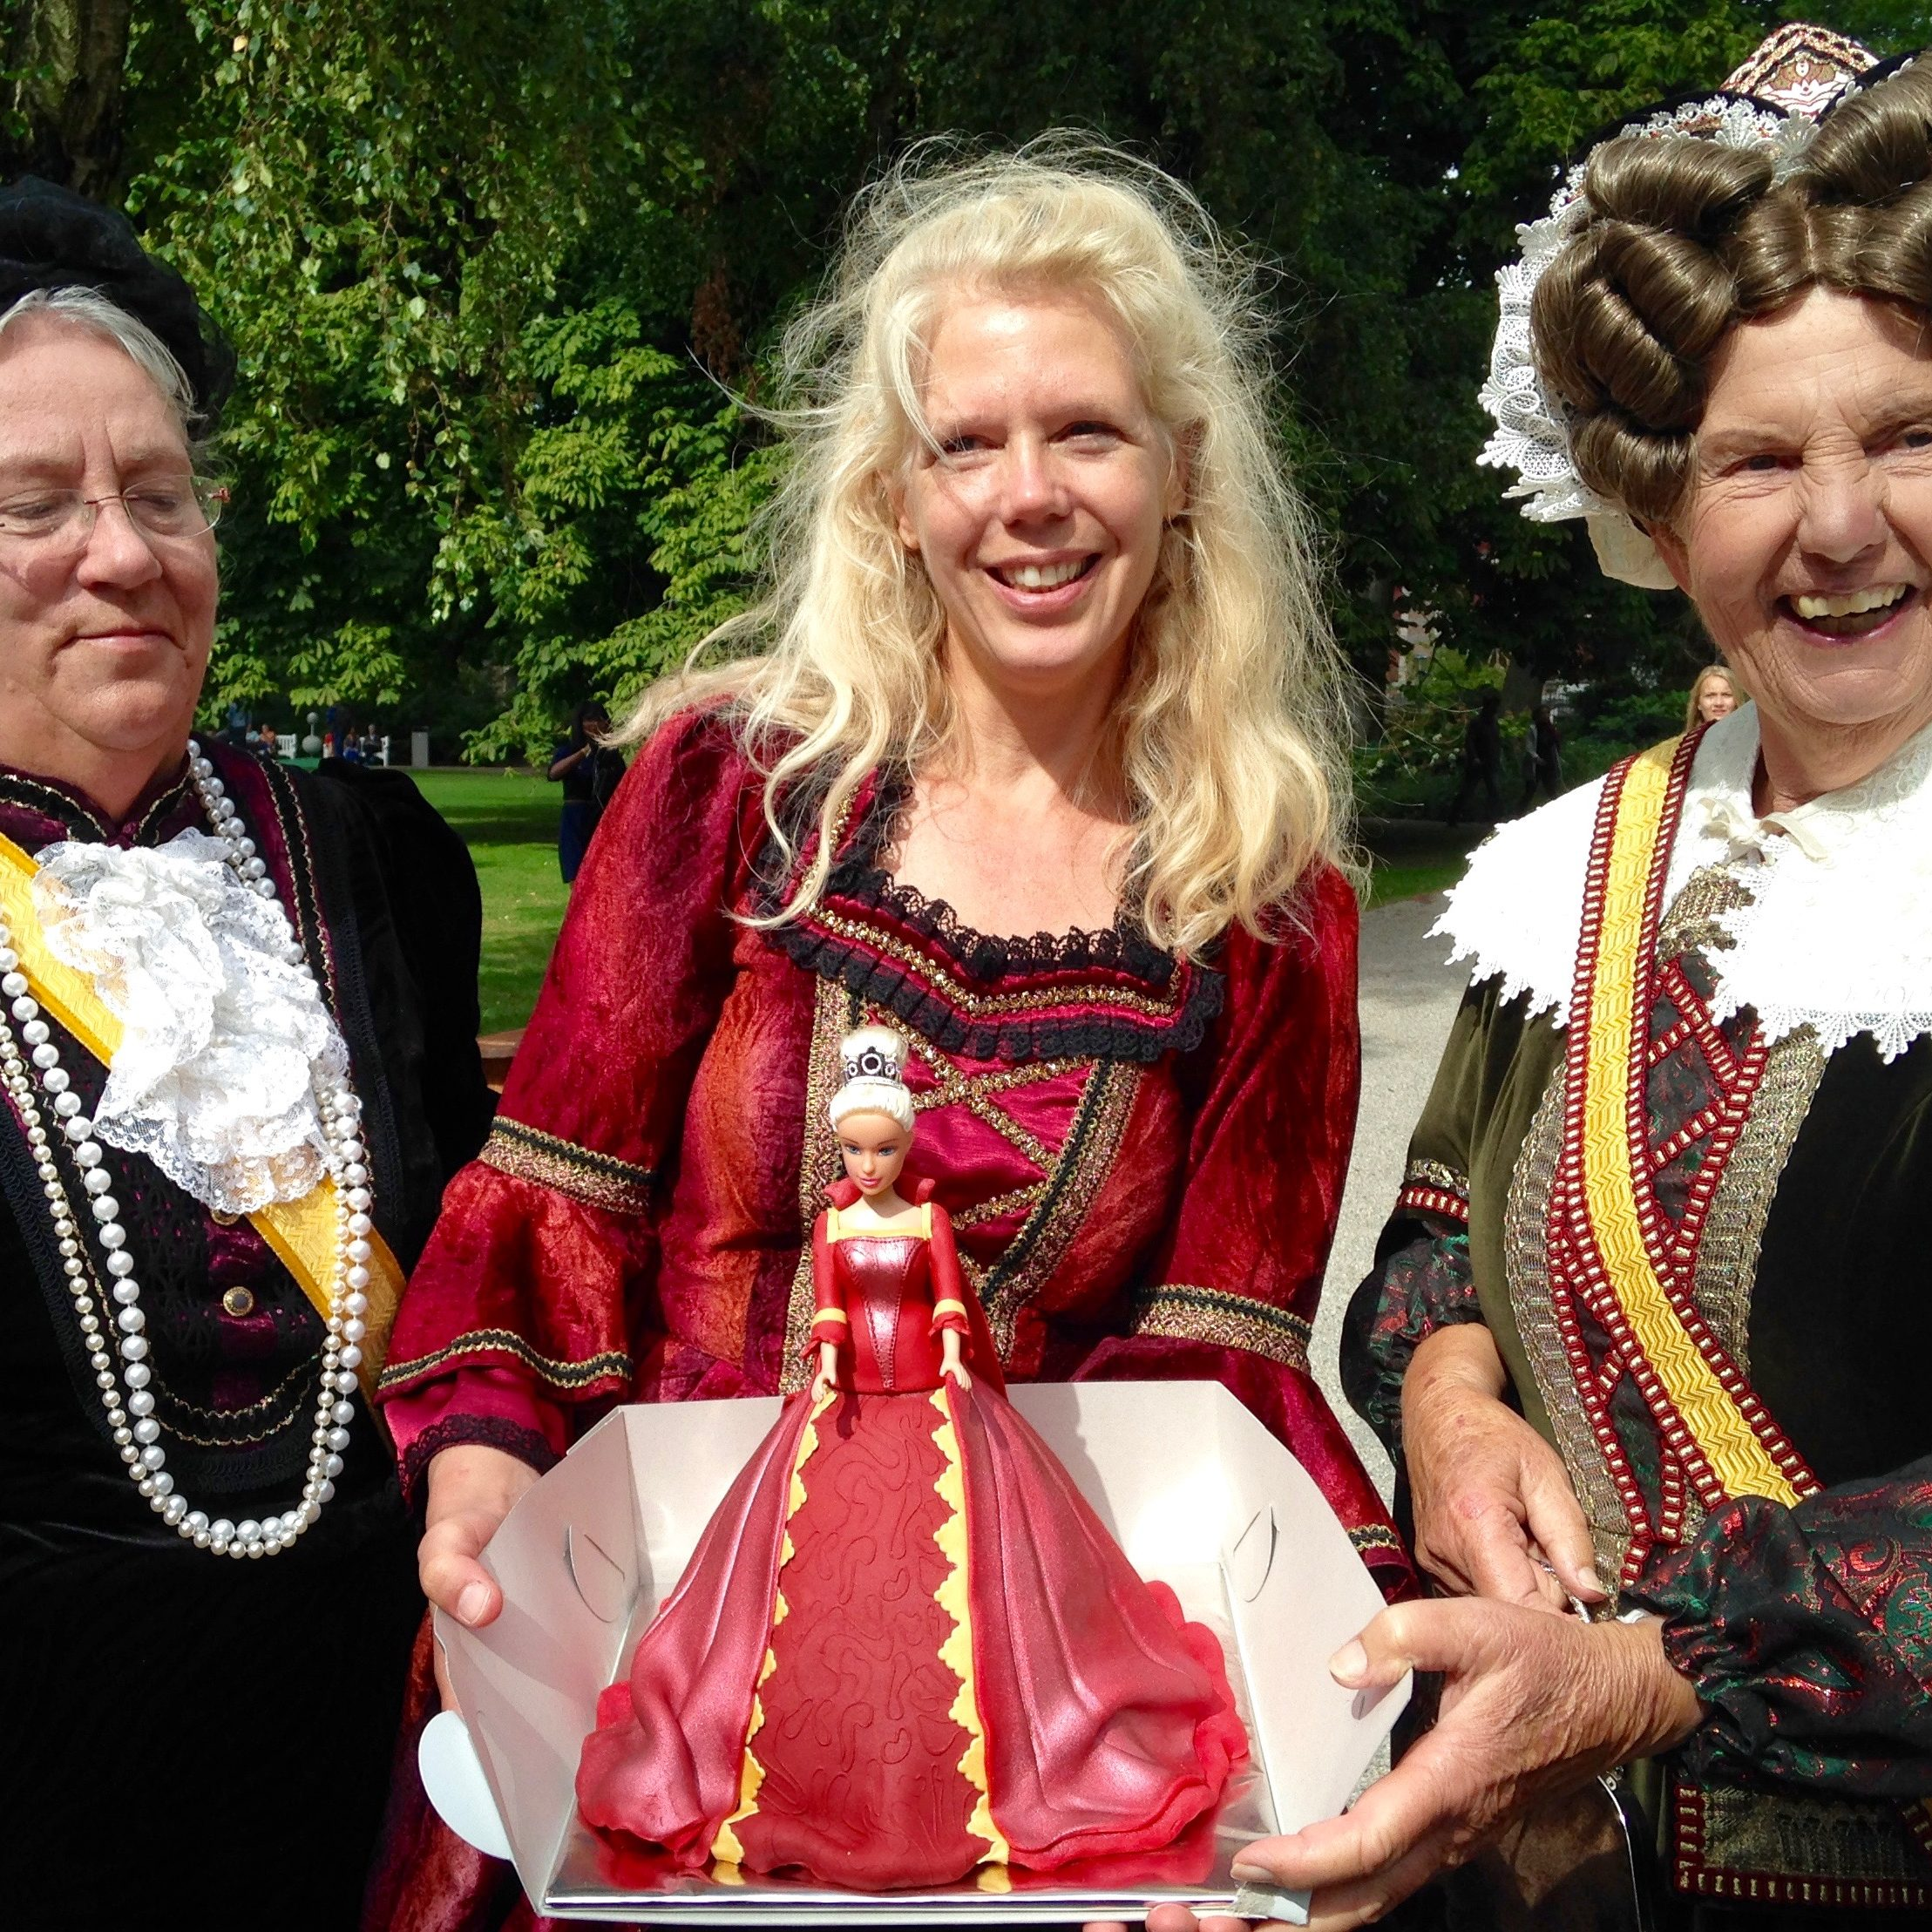 Haags-Historisch-Festijn-2016-Angelique-Schipper-Cake-du-Fortin-Koninginnen-Paleistuin